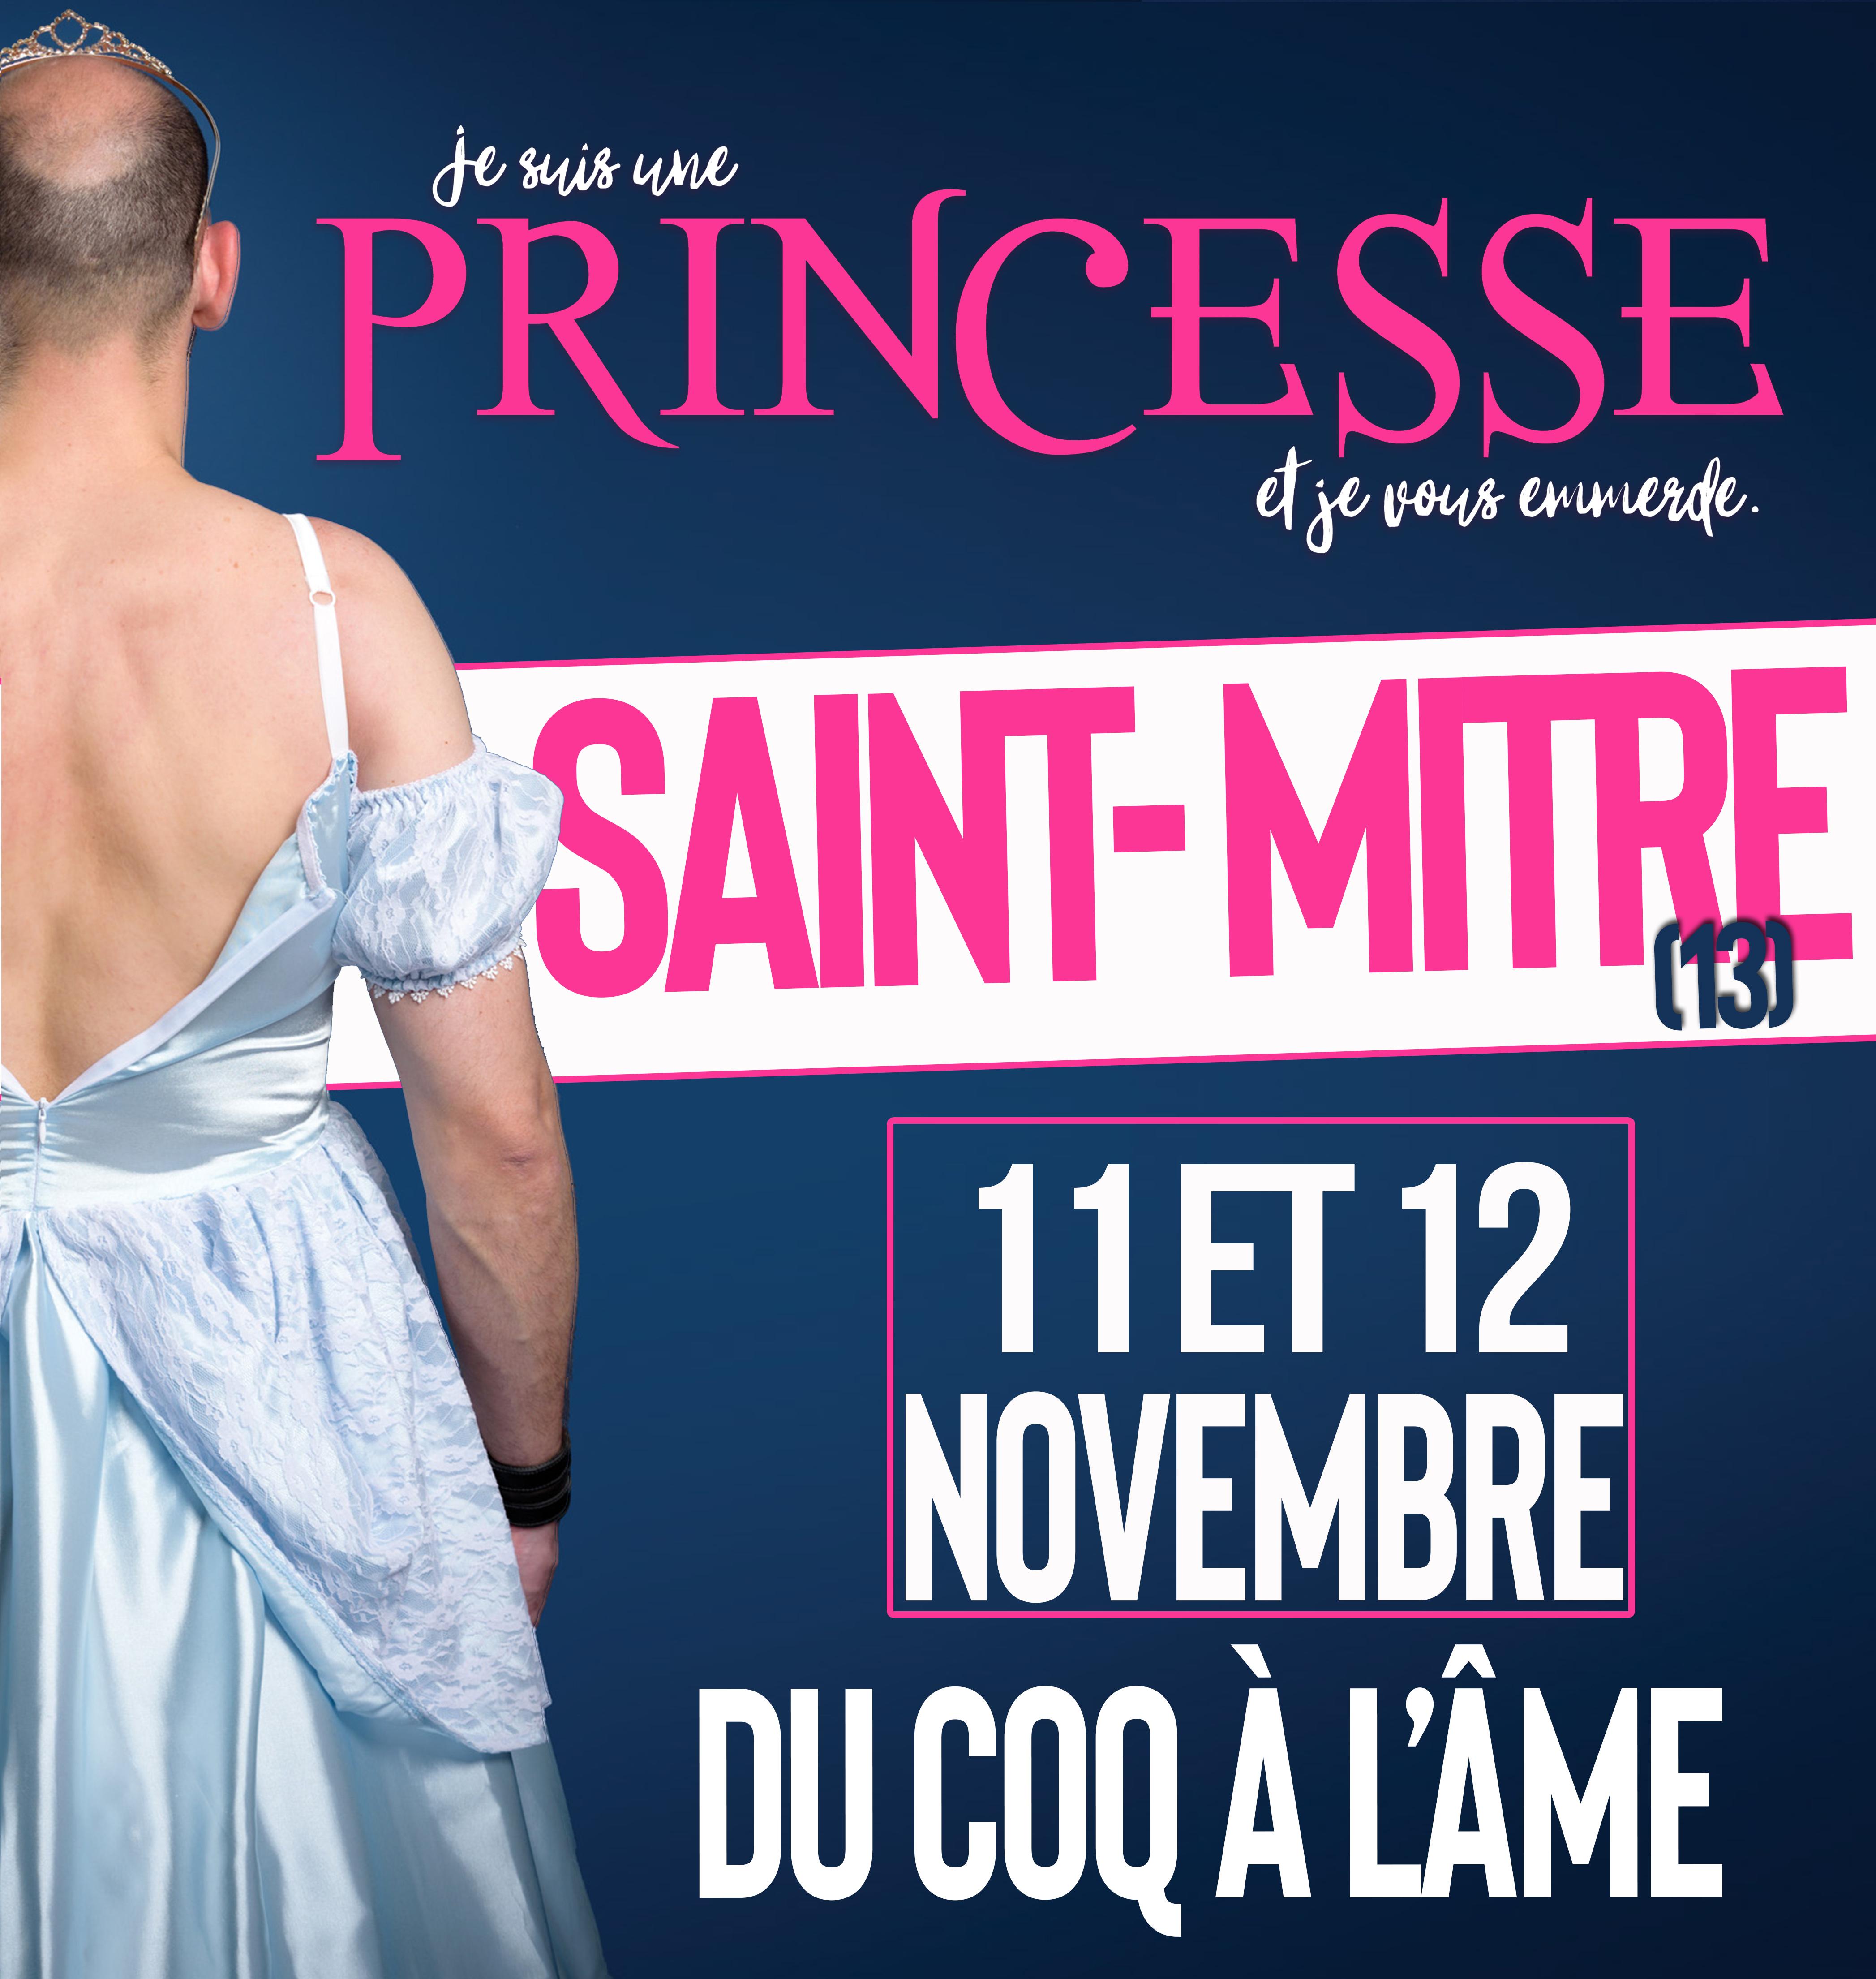 saintmitre